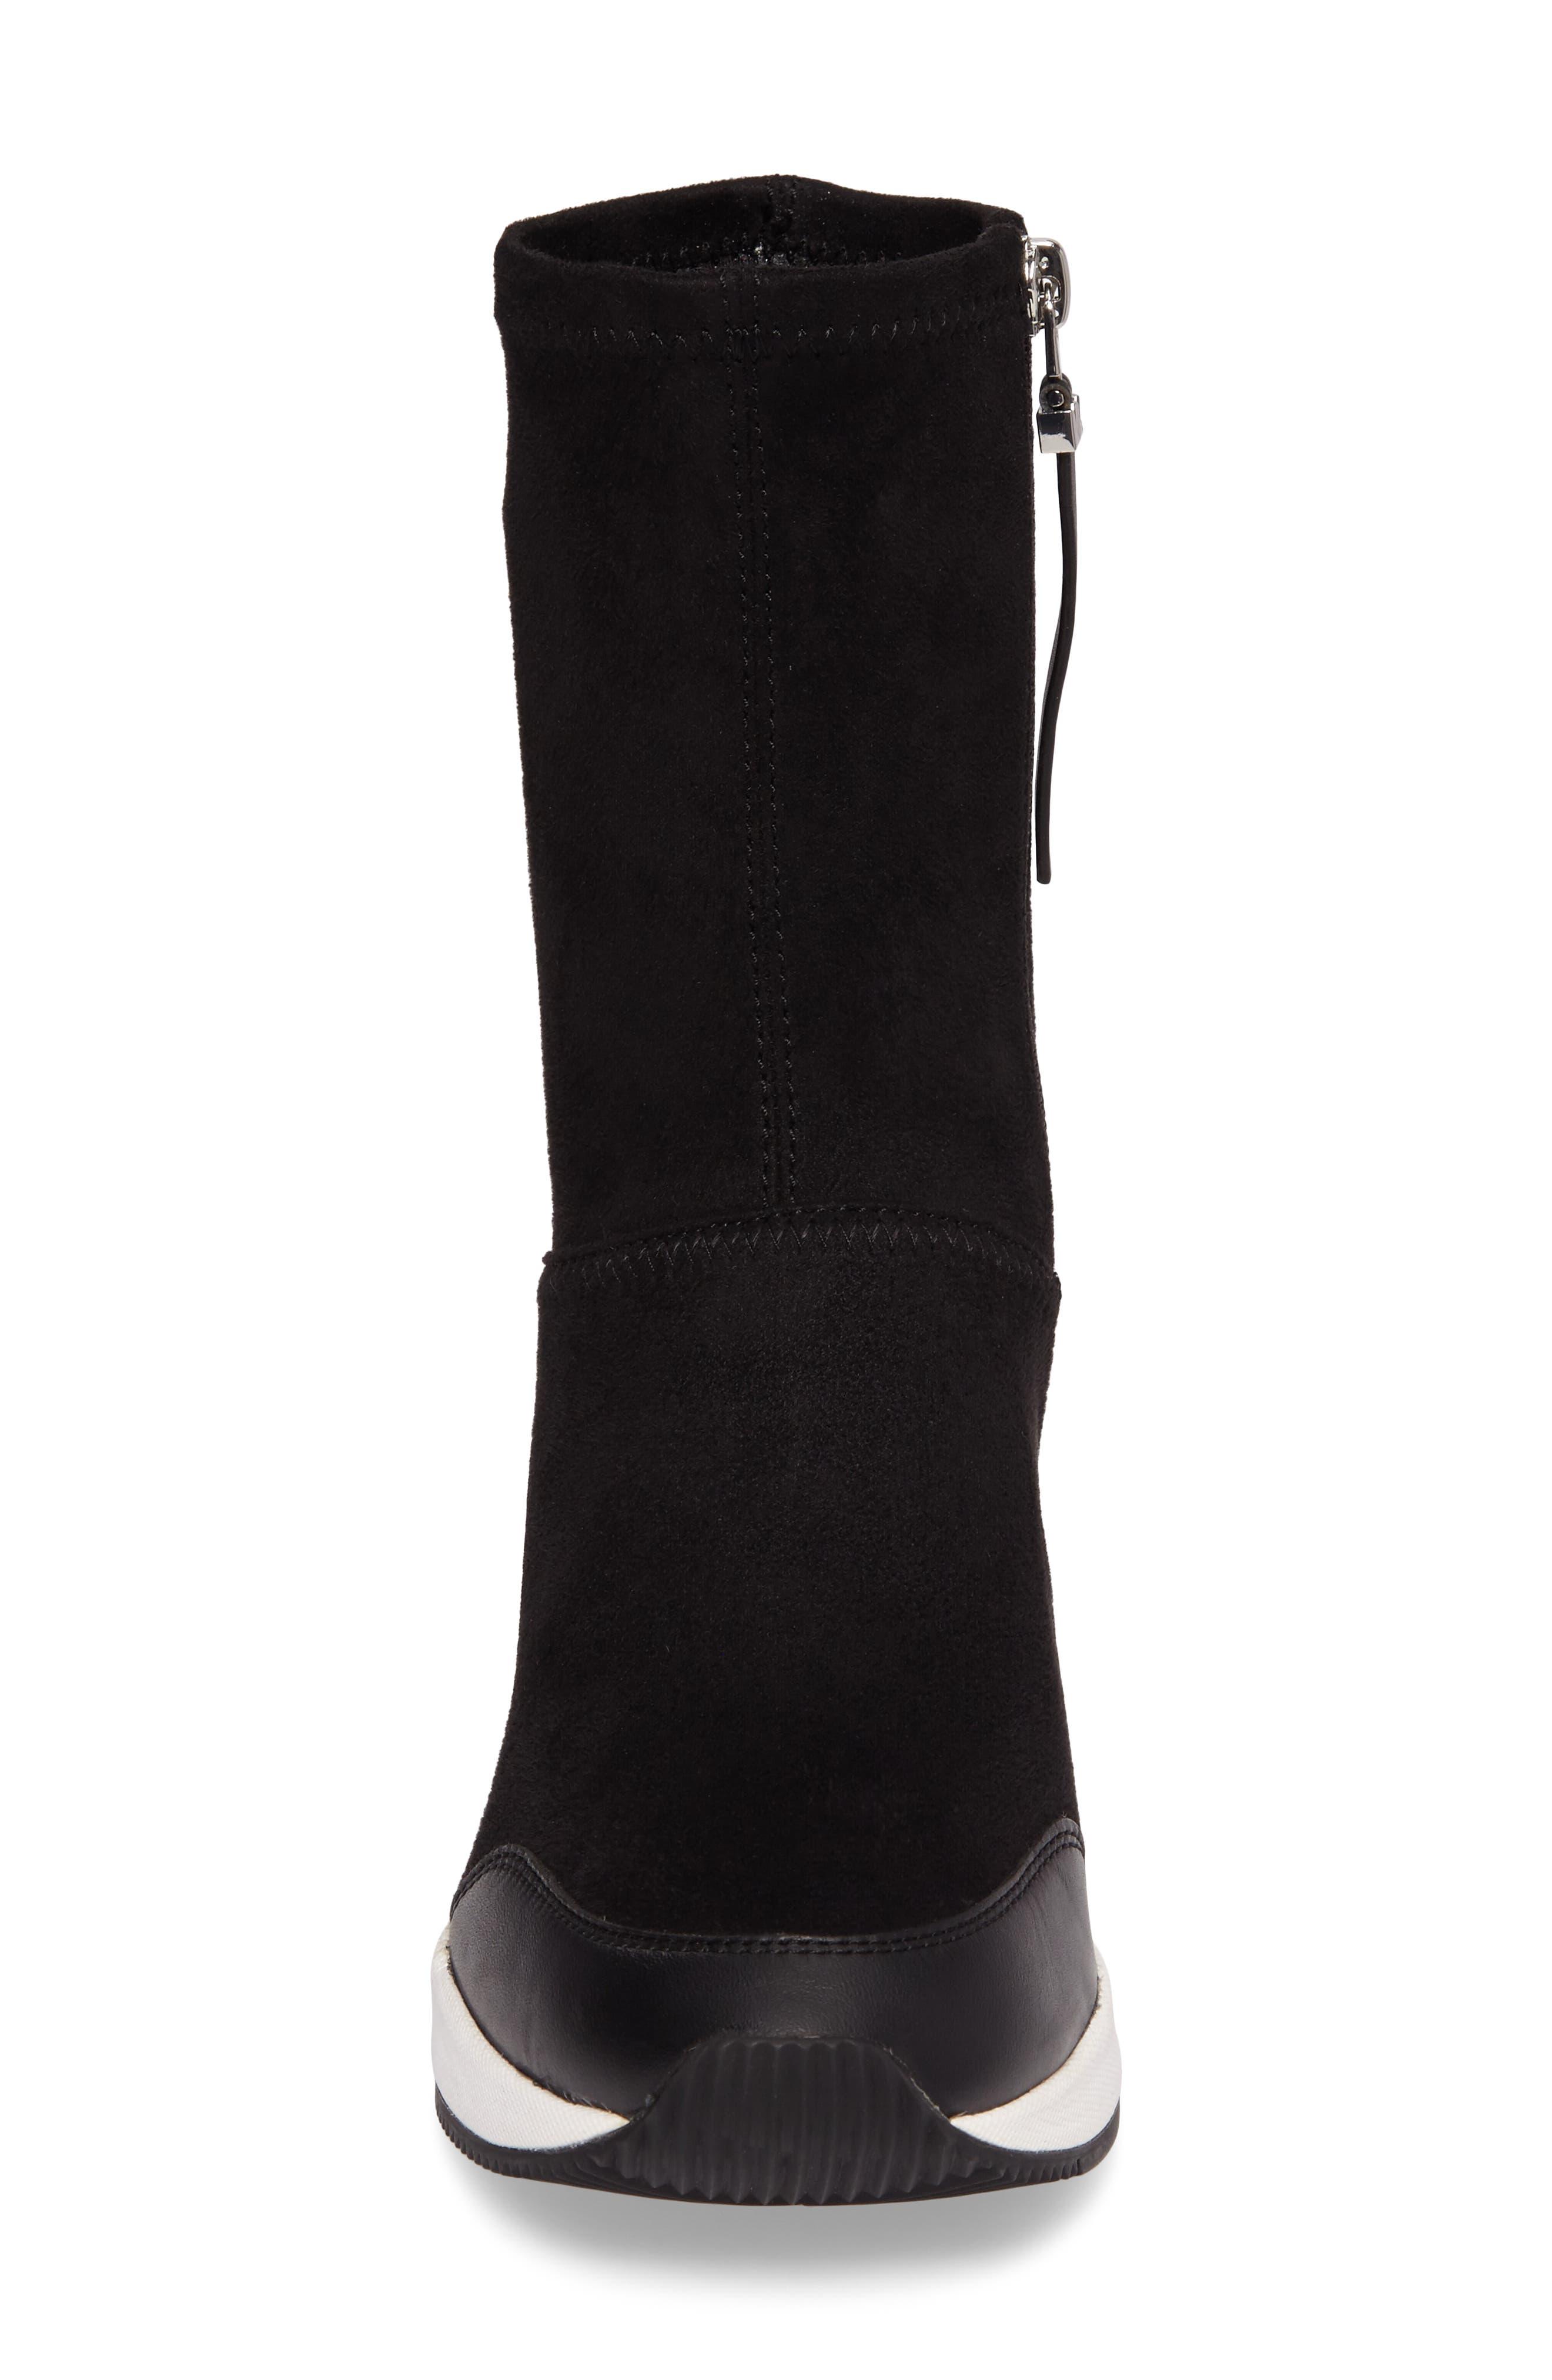 'Ace' Wedge Sneaker Bootie,                             Alternate thumbnail 4, color,                             BLACK SUEDE